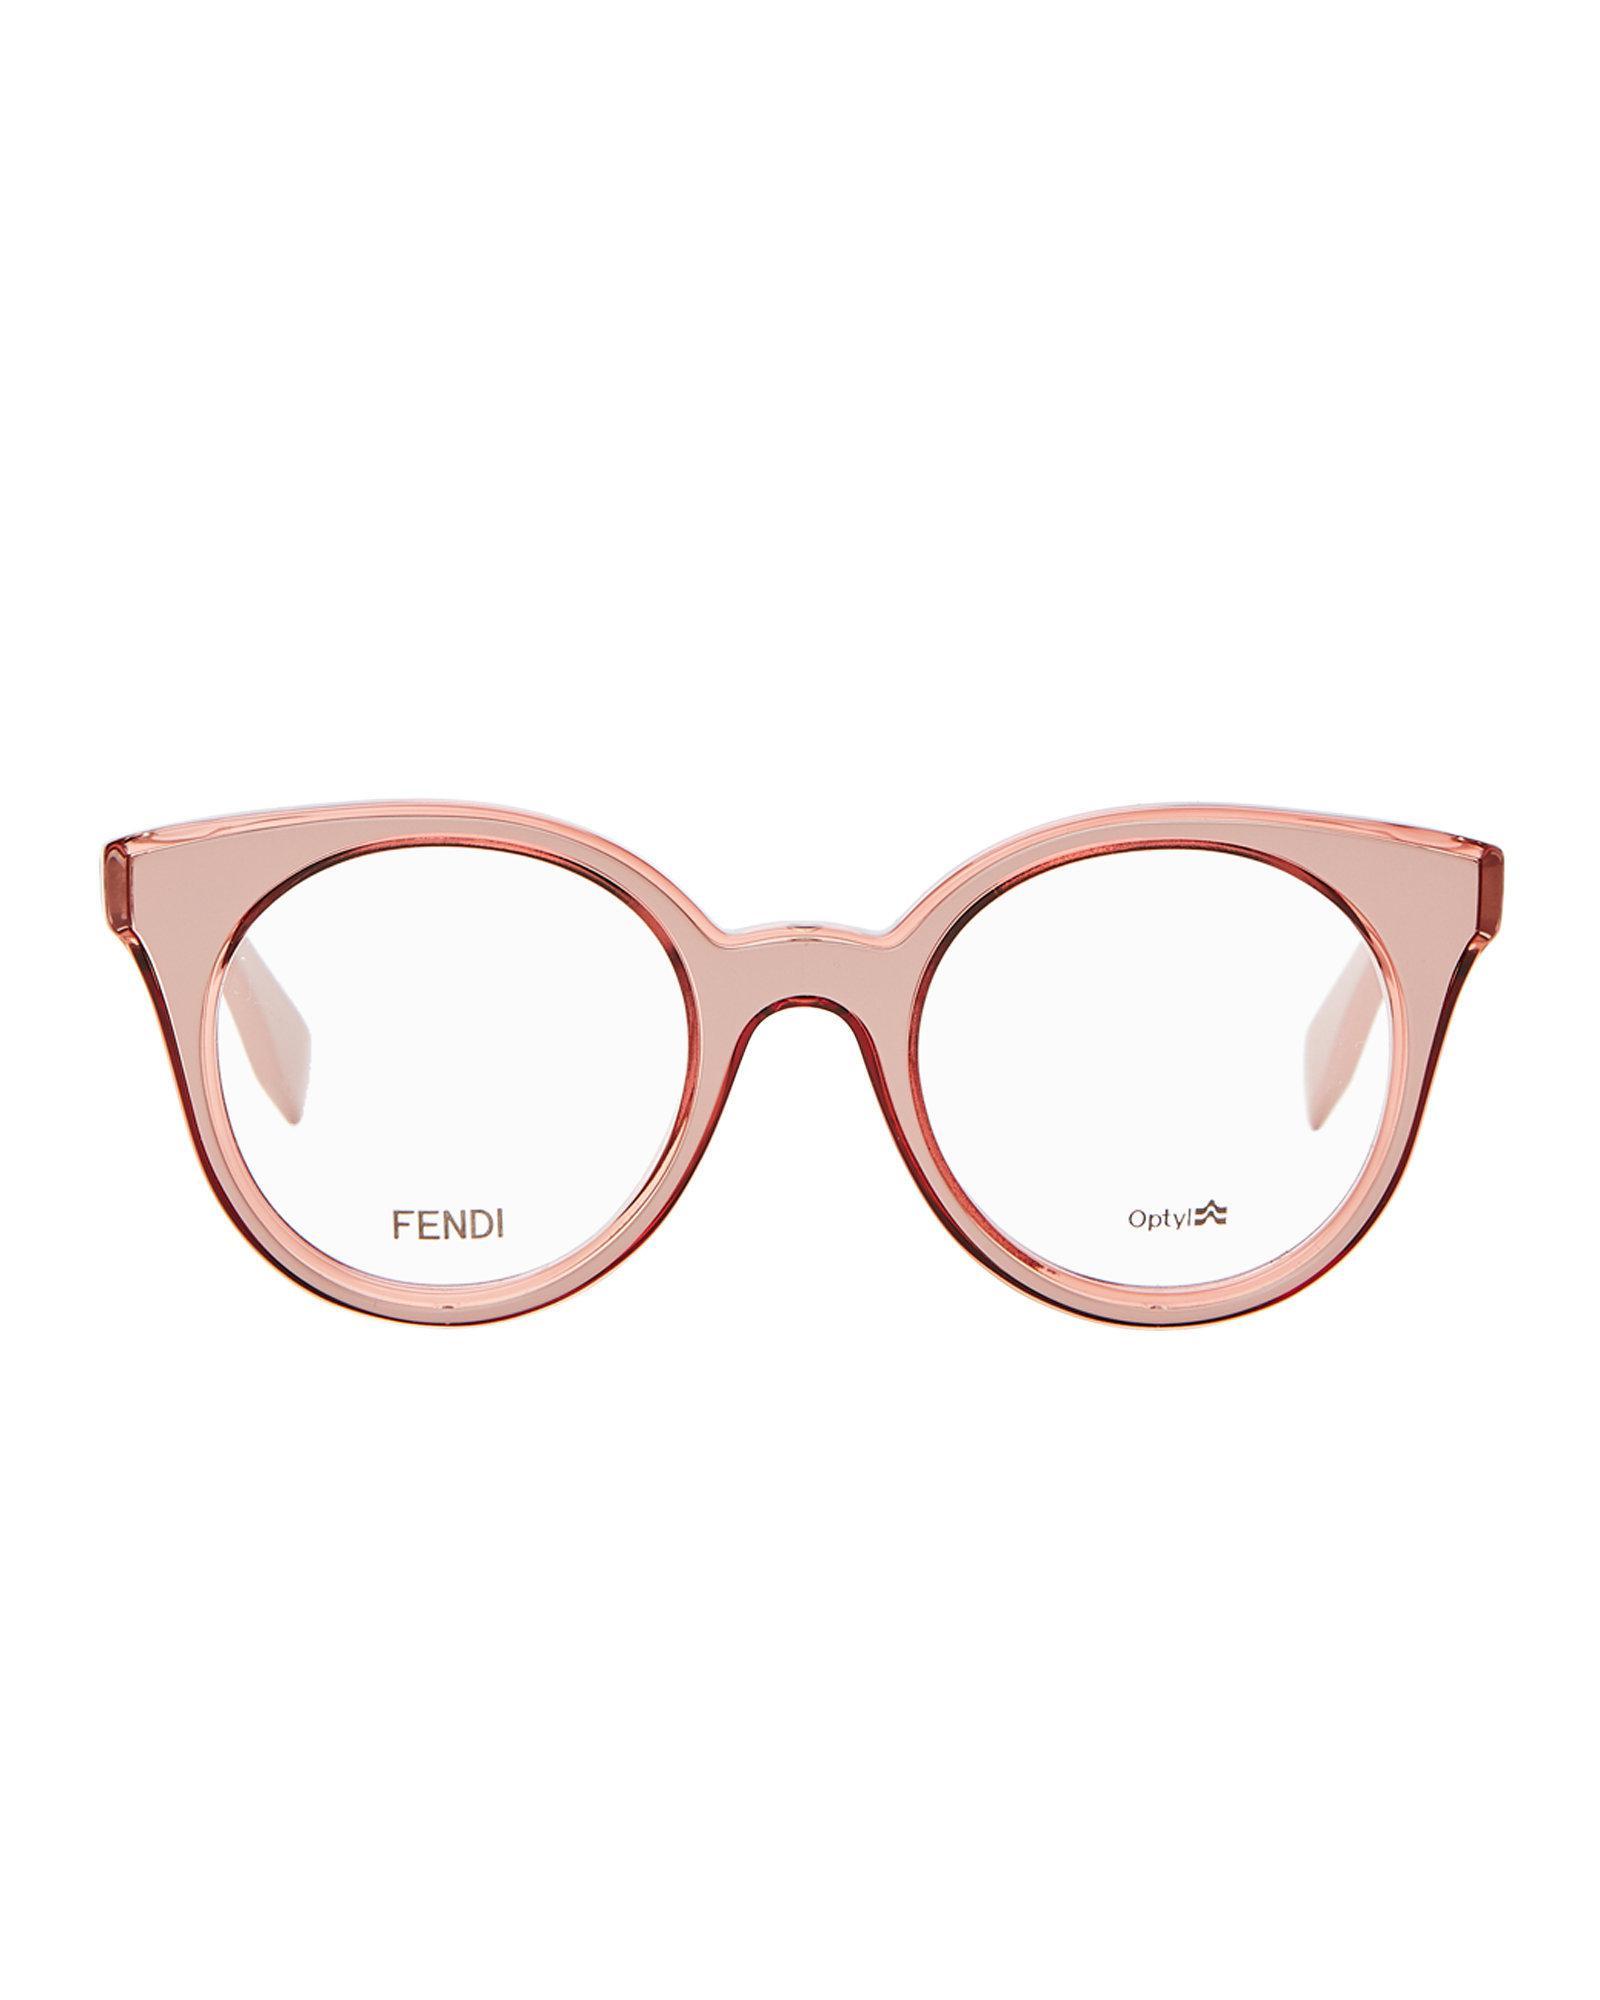 8f1db5de039 Gallery. Previously sold at  Century 21 · Women s Fendi Orchidea Women s  Red Sunglasses ...